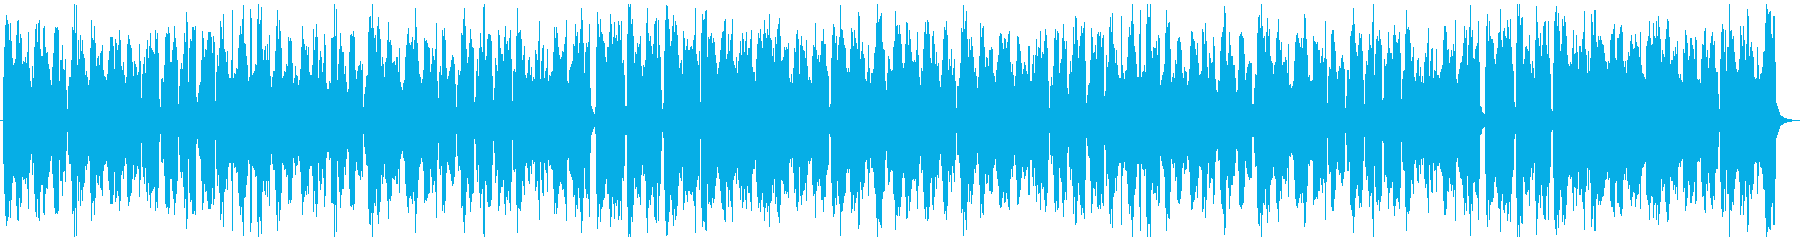 French Accordion Waltzの再生済みの波形